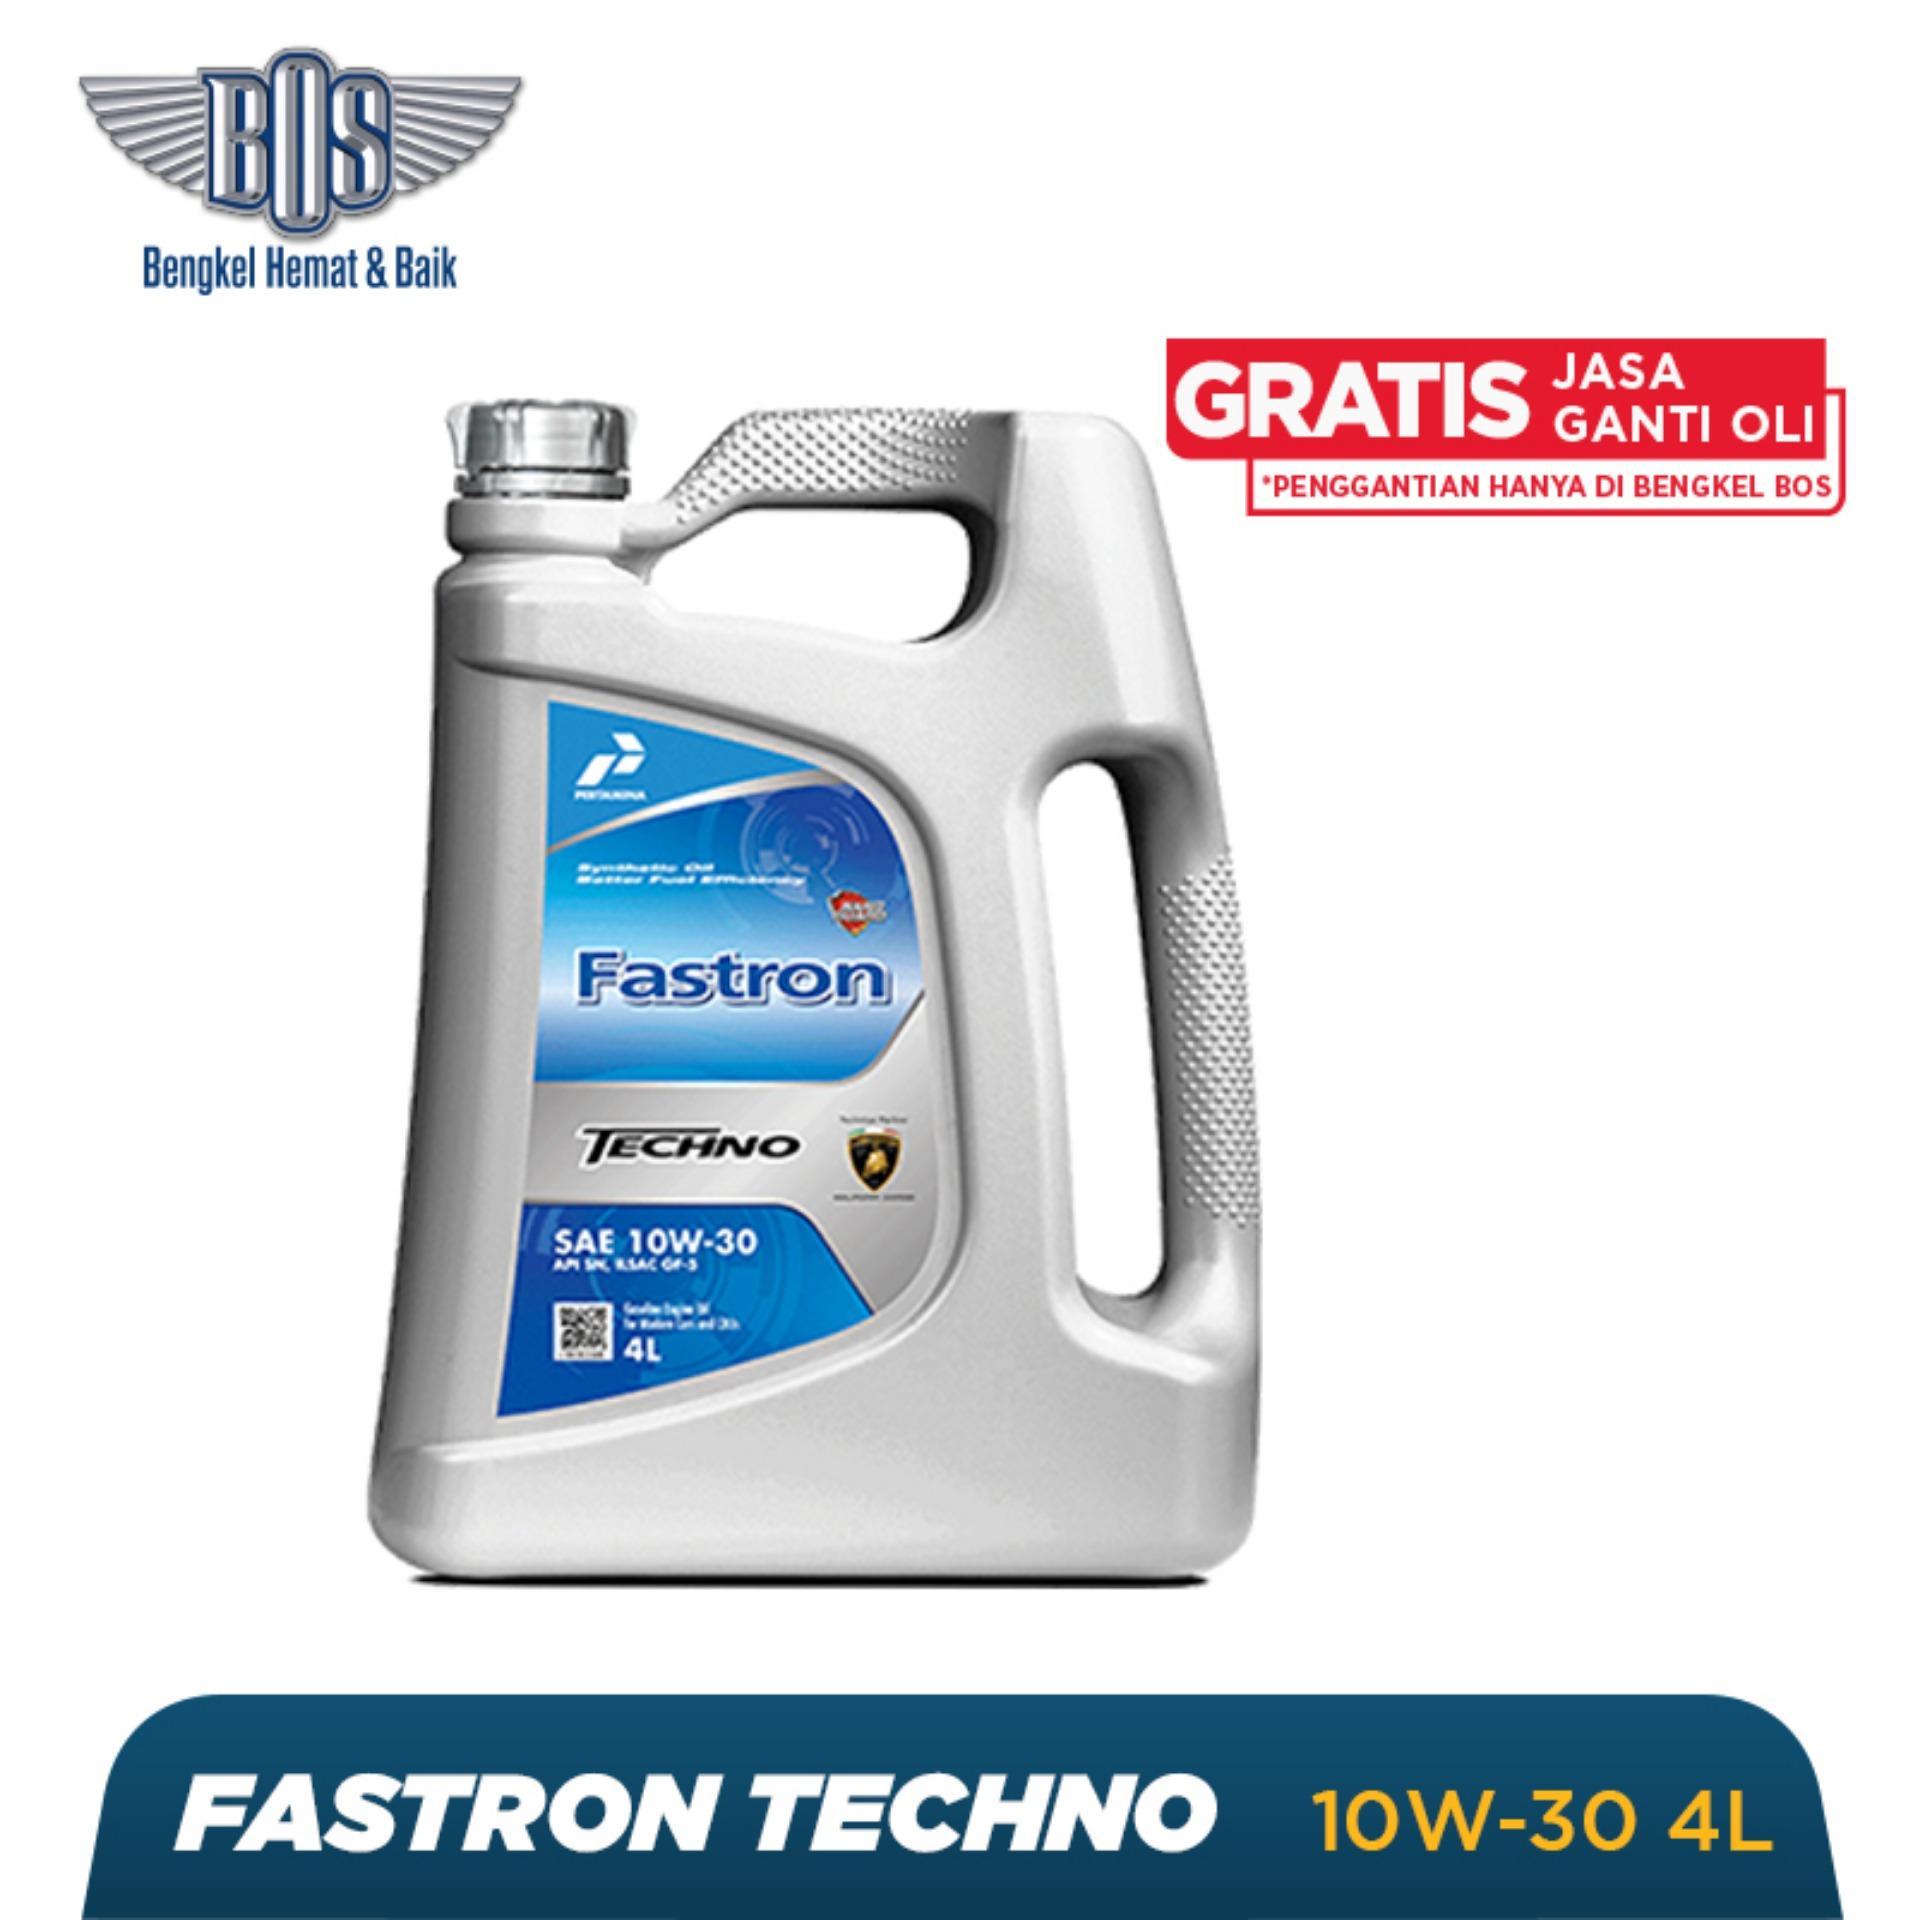 Oli Mobil Fastron Techno - 10W-30 - GALON -  Gratis Jasa Ganti Oli dan Check Up Kendaraan